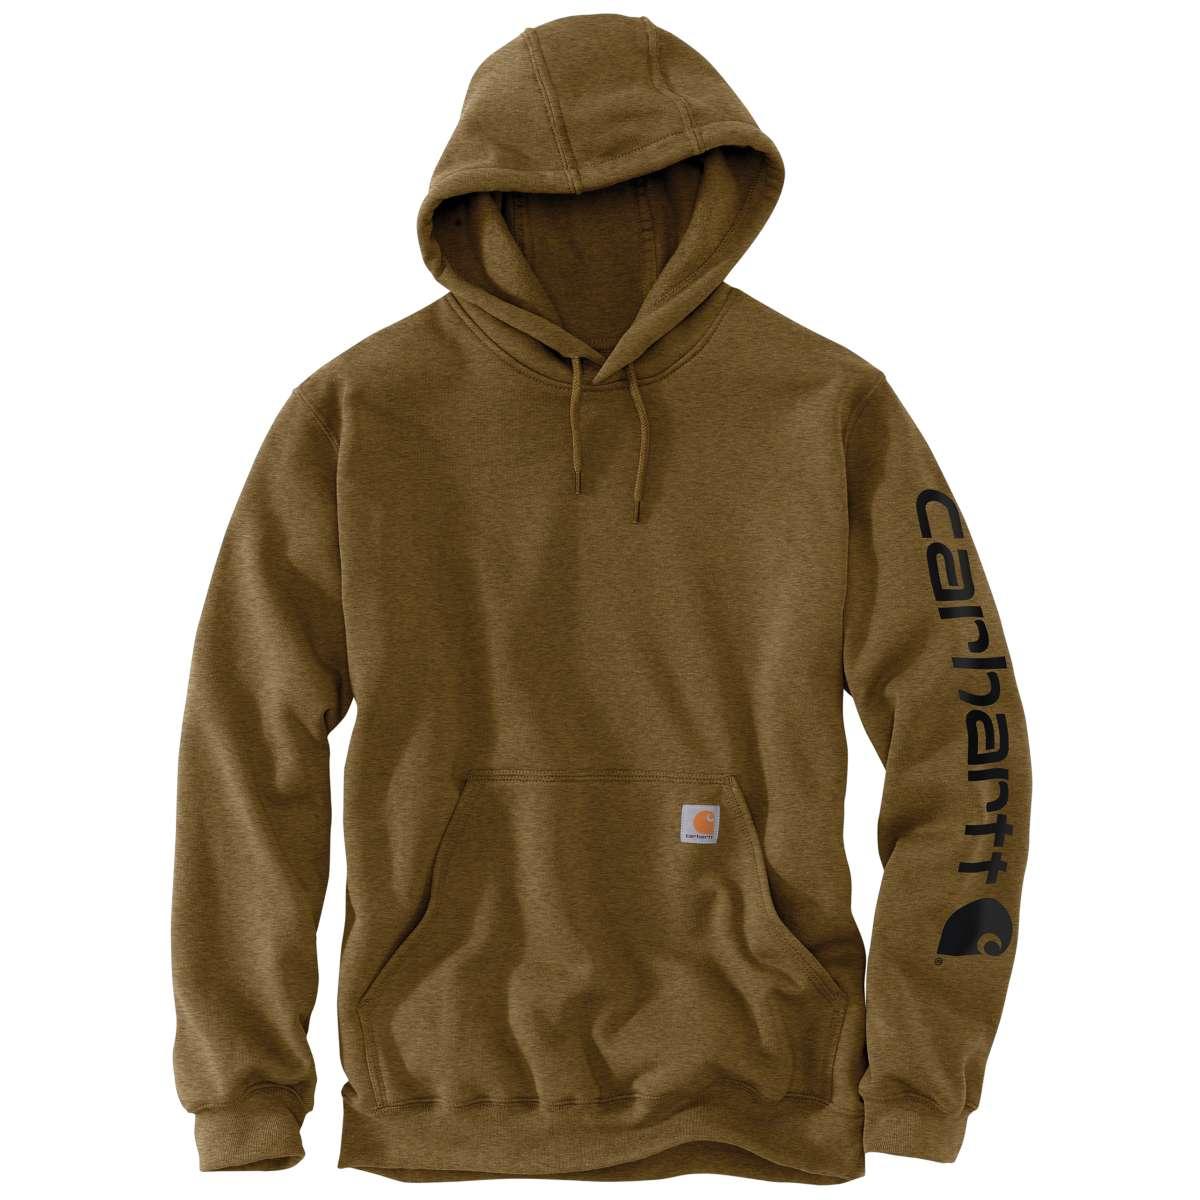 Carhartt Men's K288 Signature Sleeve Logo Hoodie, Extended Sizes - Brown, 2XLT